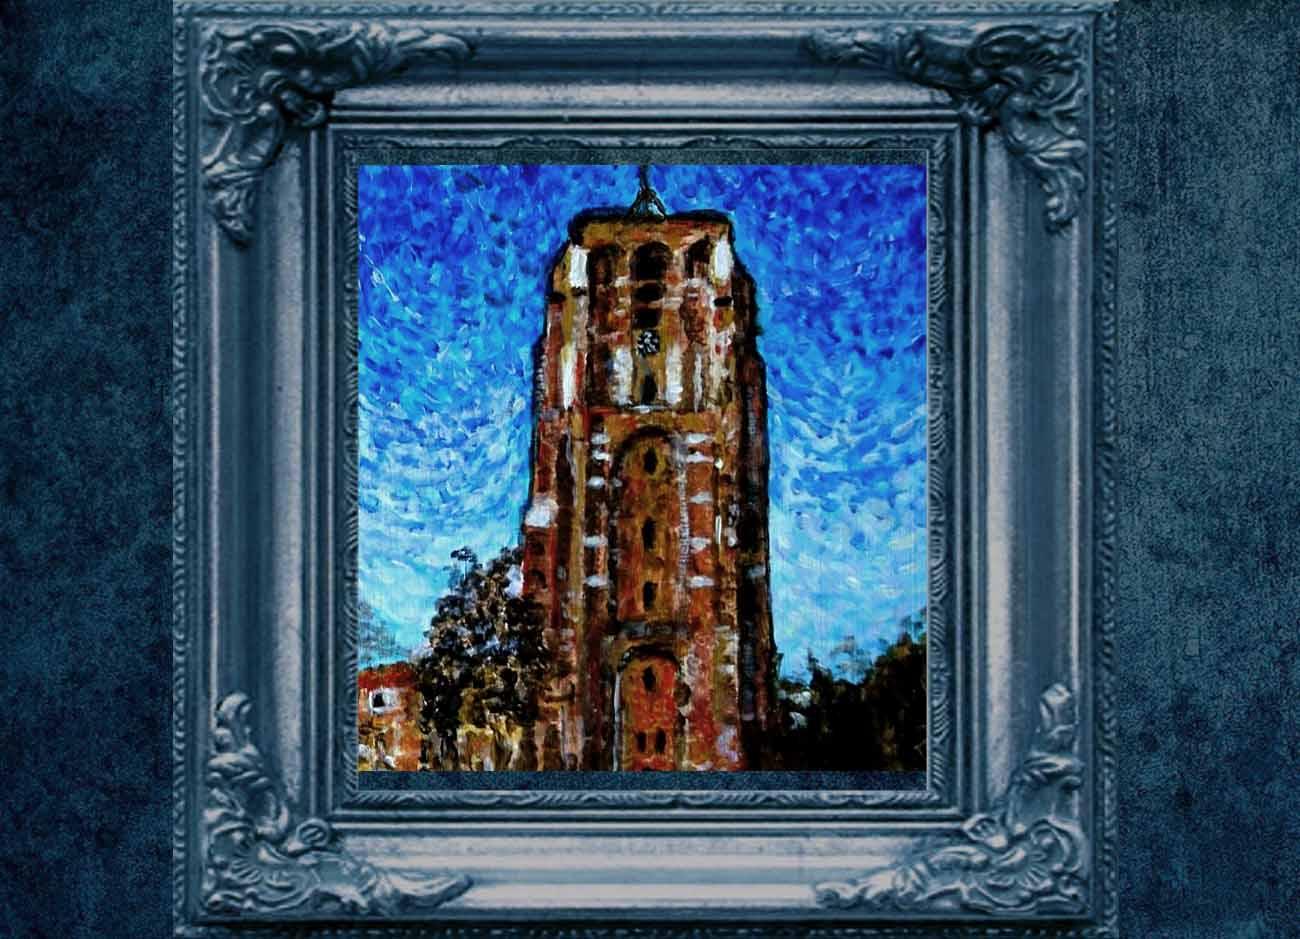 Jogchumskunst - Jogchum Veenstra kunstwerken - Realisme - Oldehove - van Gogh oefening 2